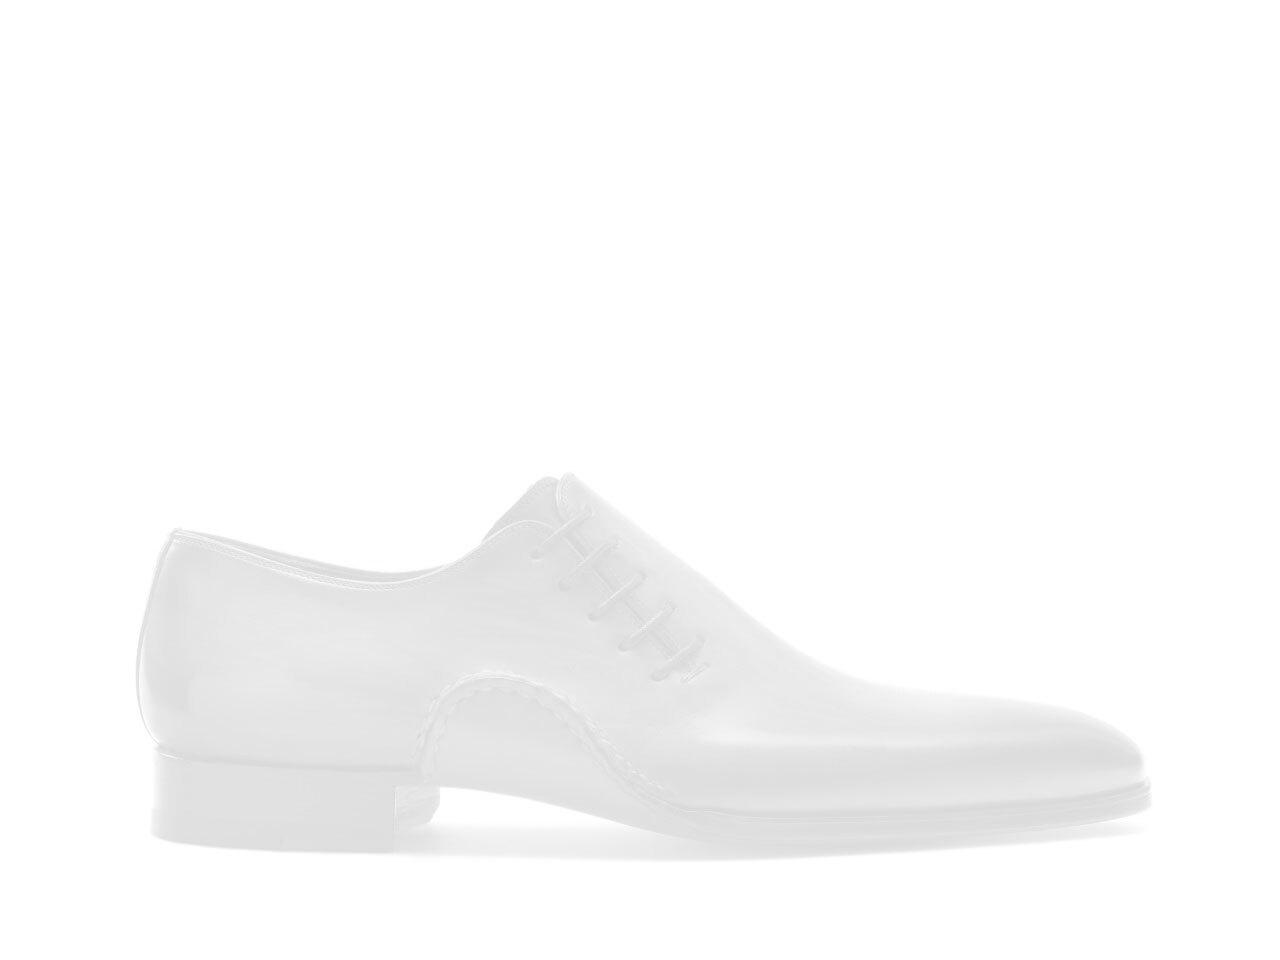 La Mancha Footwear